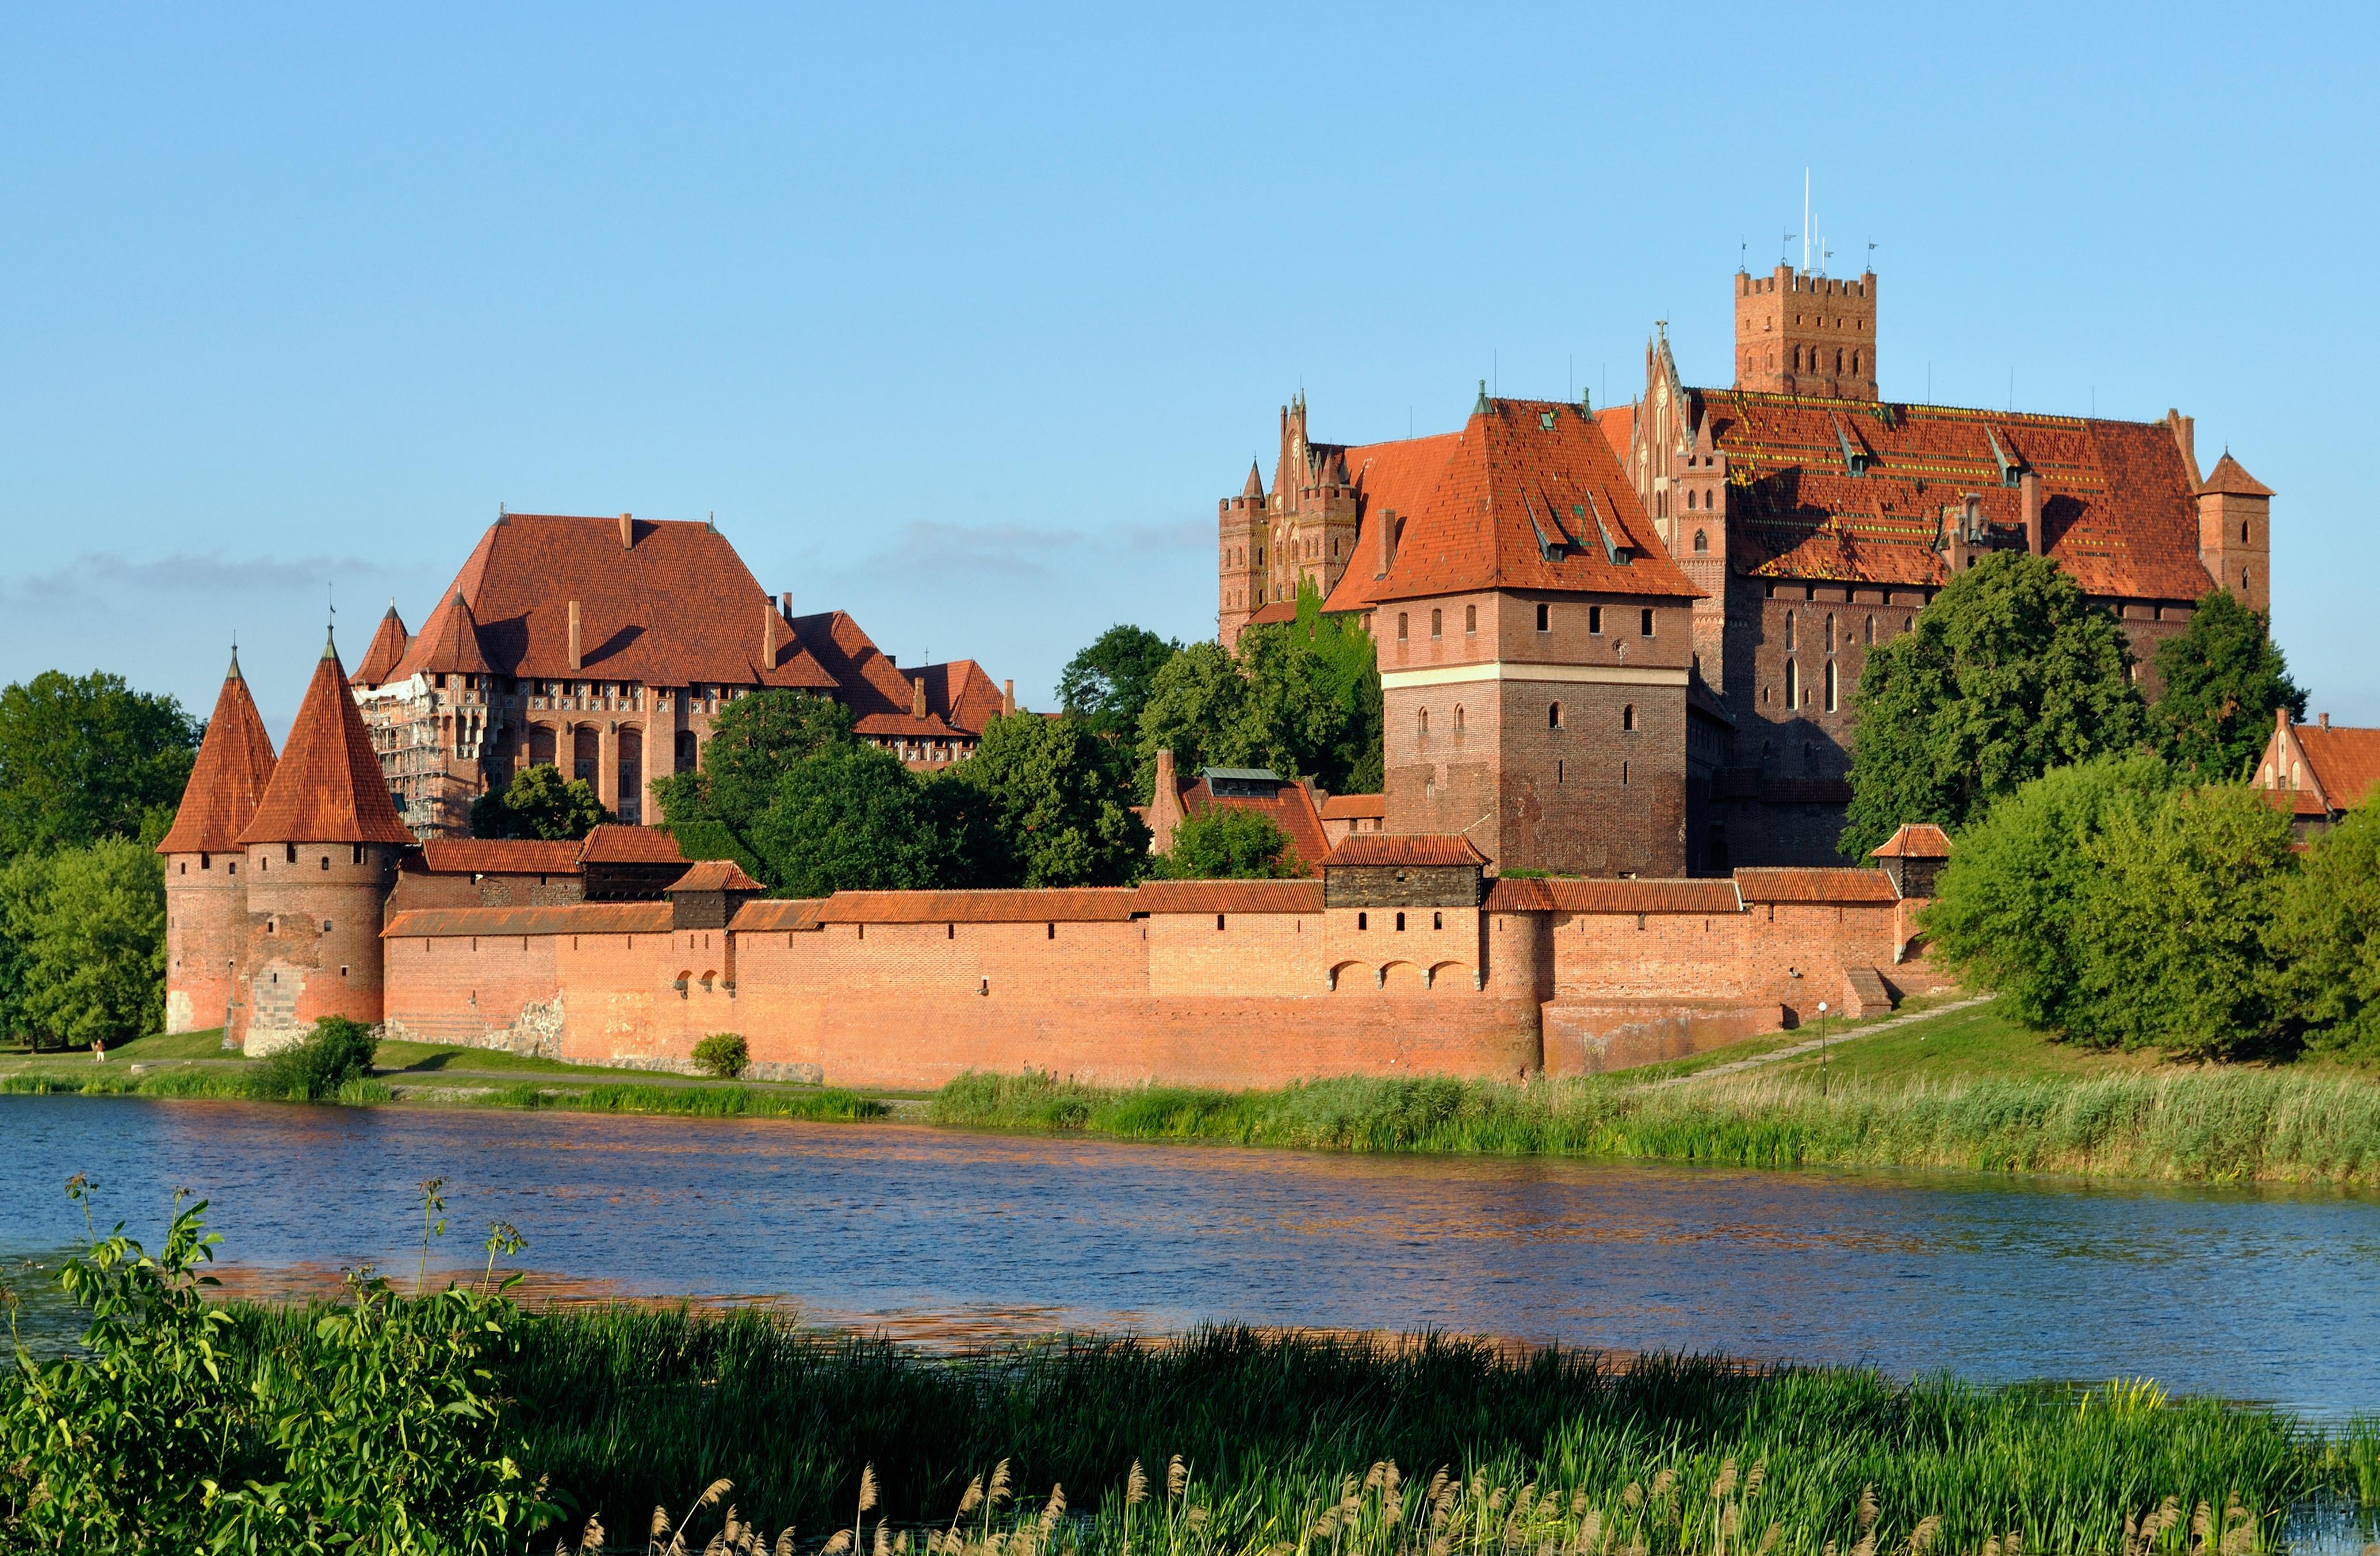 Panorama_of_Malbork_Castle%2C_part_4.jpg